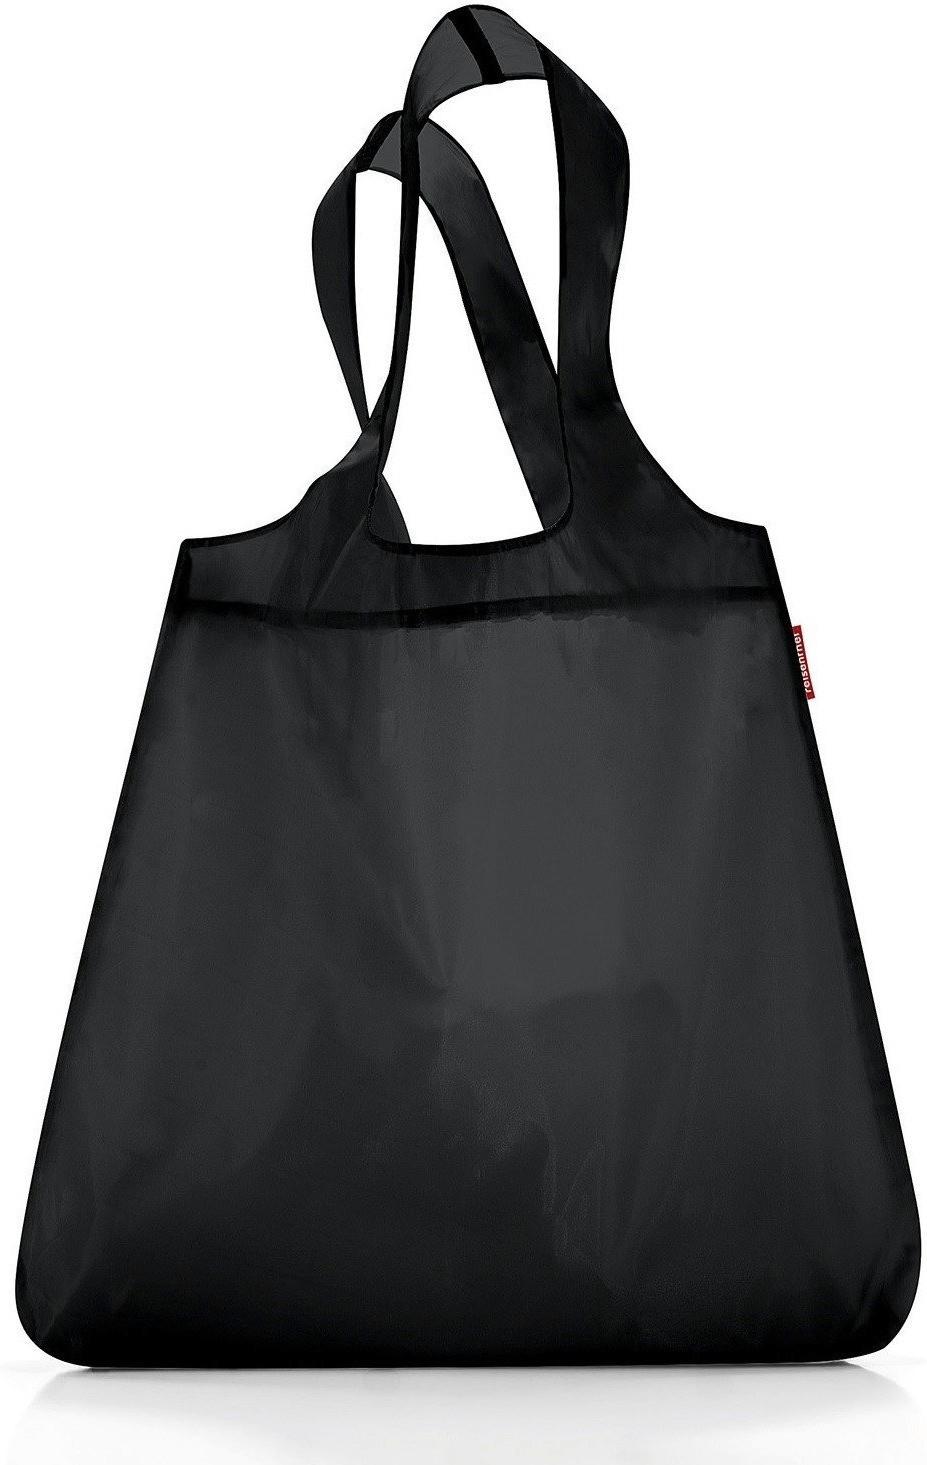 Reisenthel Mini Maxi Shopper black